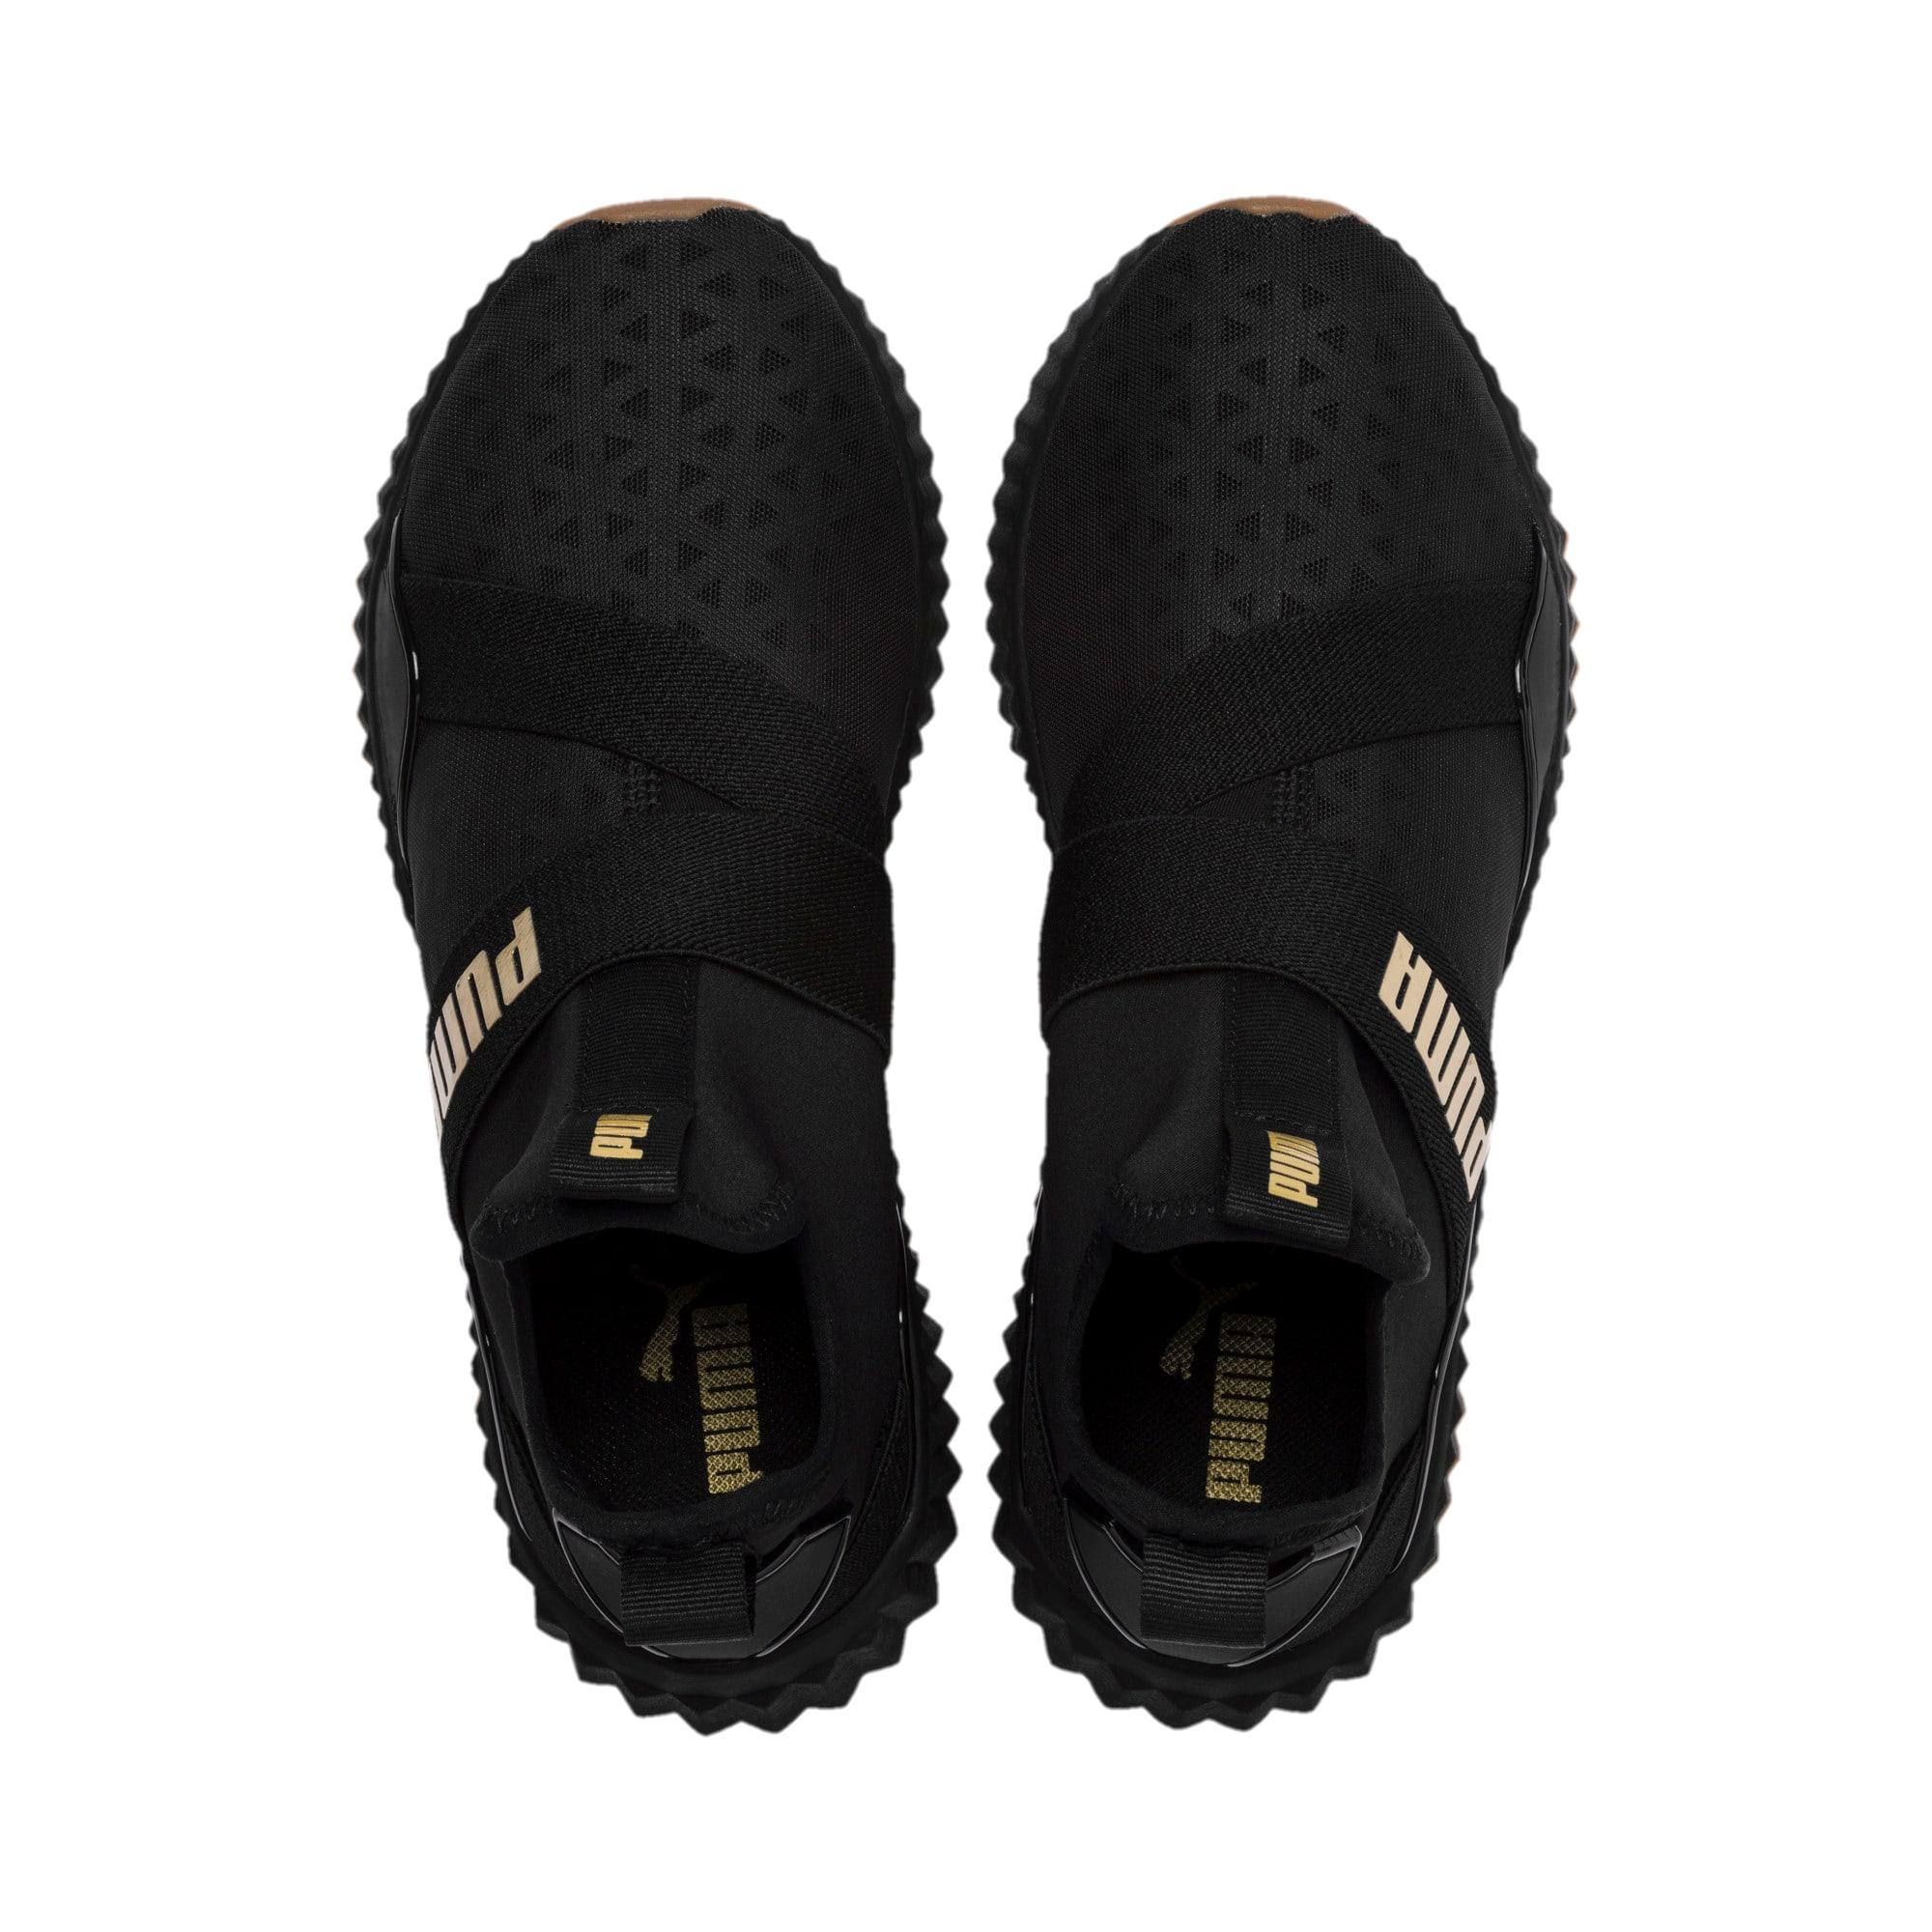 Thumbnail 7 of Defy Mid Sparkle Women's Training Shoes, Puma Black-Metallic Gold, medium